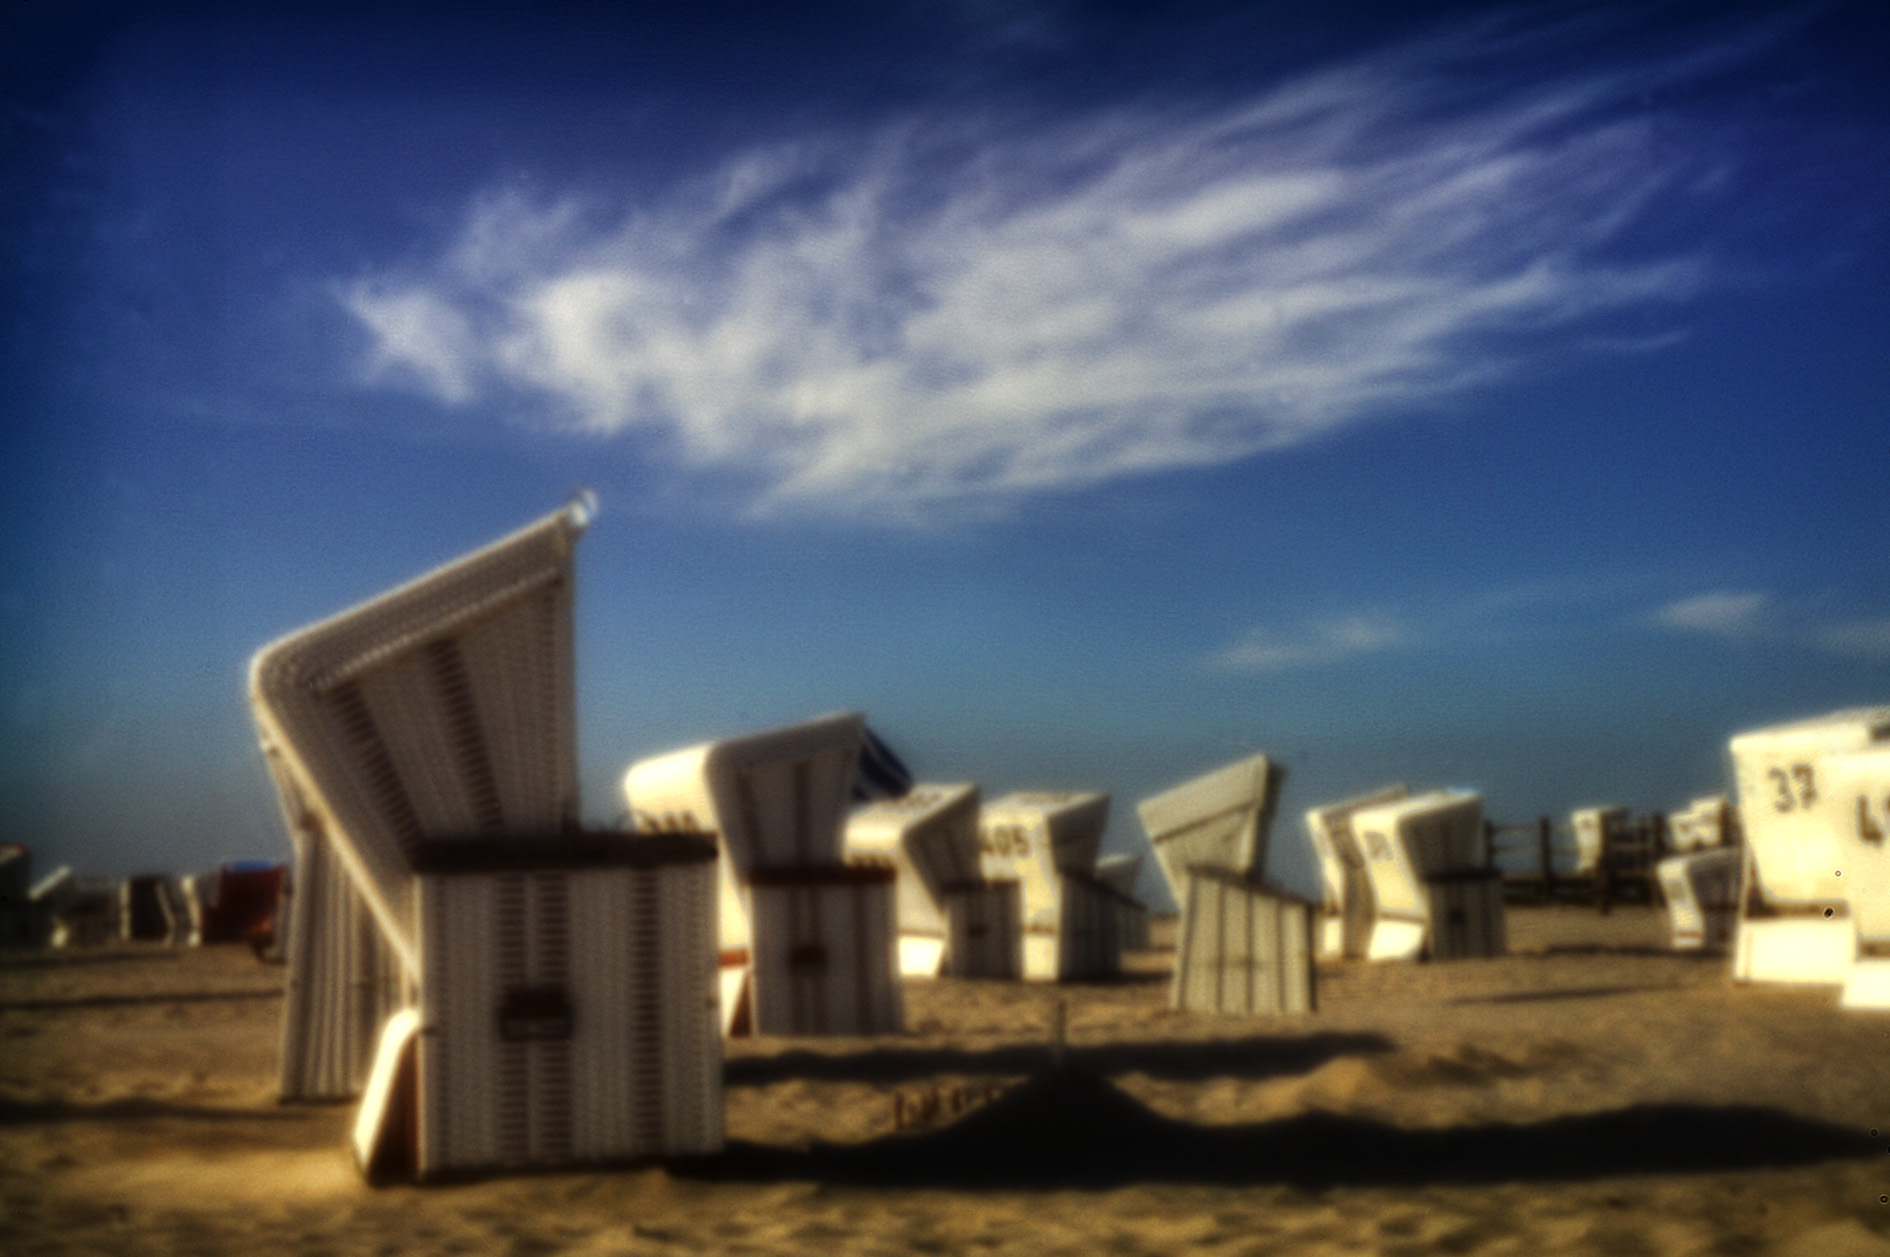 Strandkörbe (Beach Chairs) in St. Peter Ording